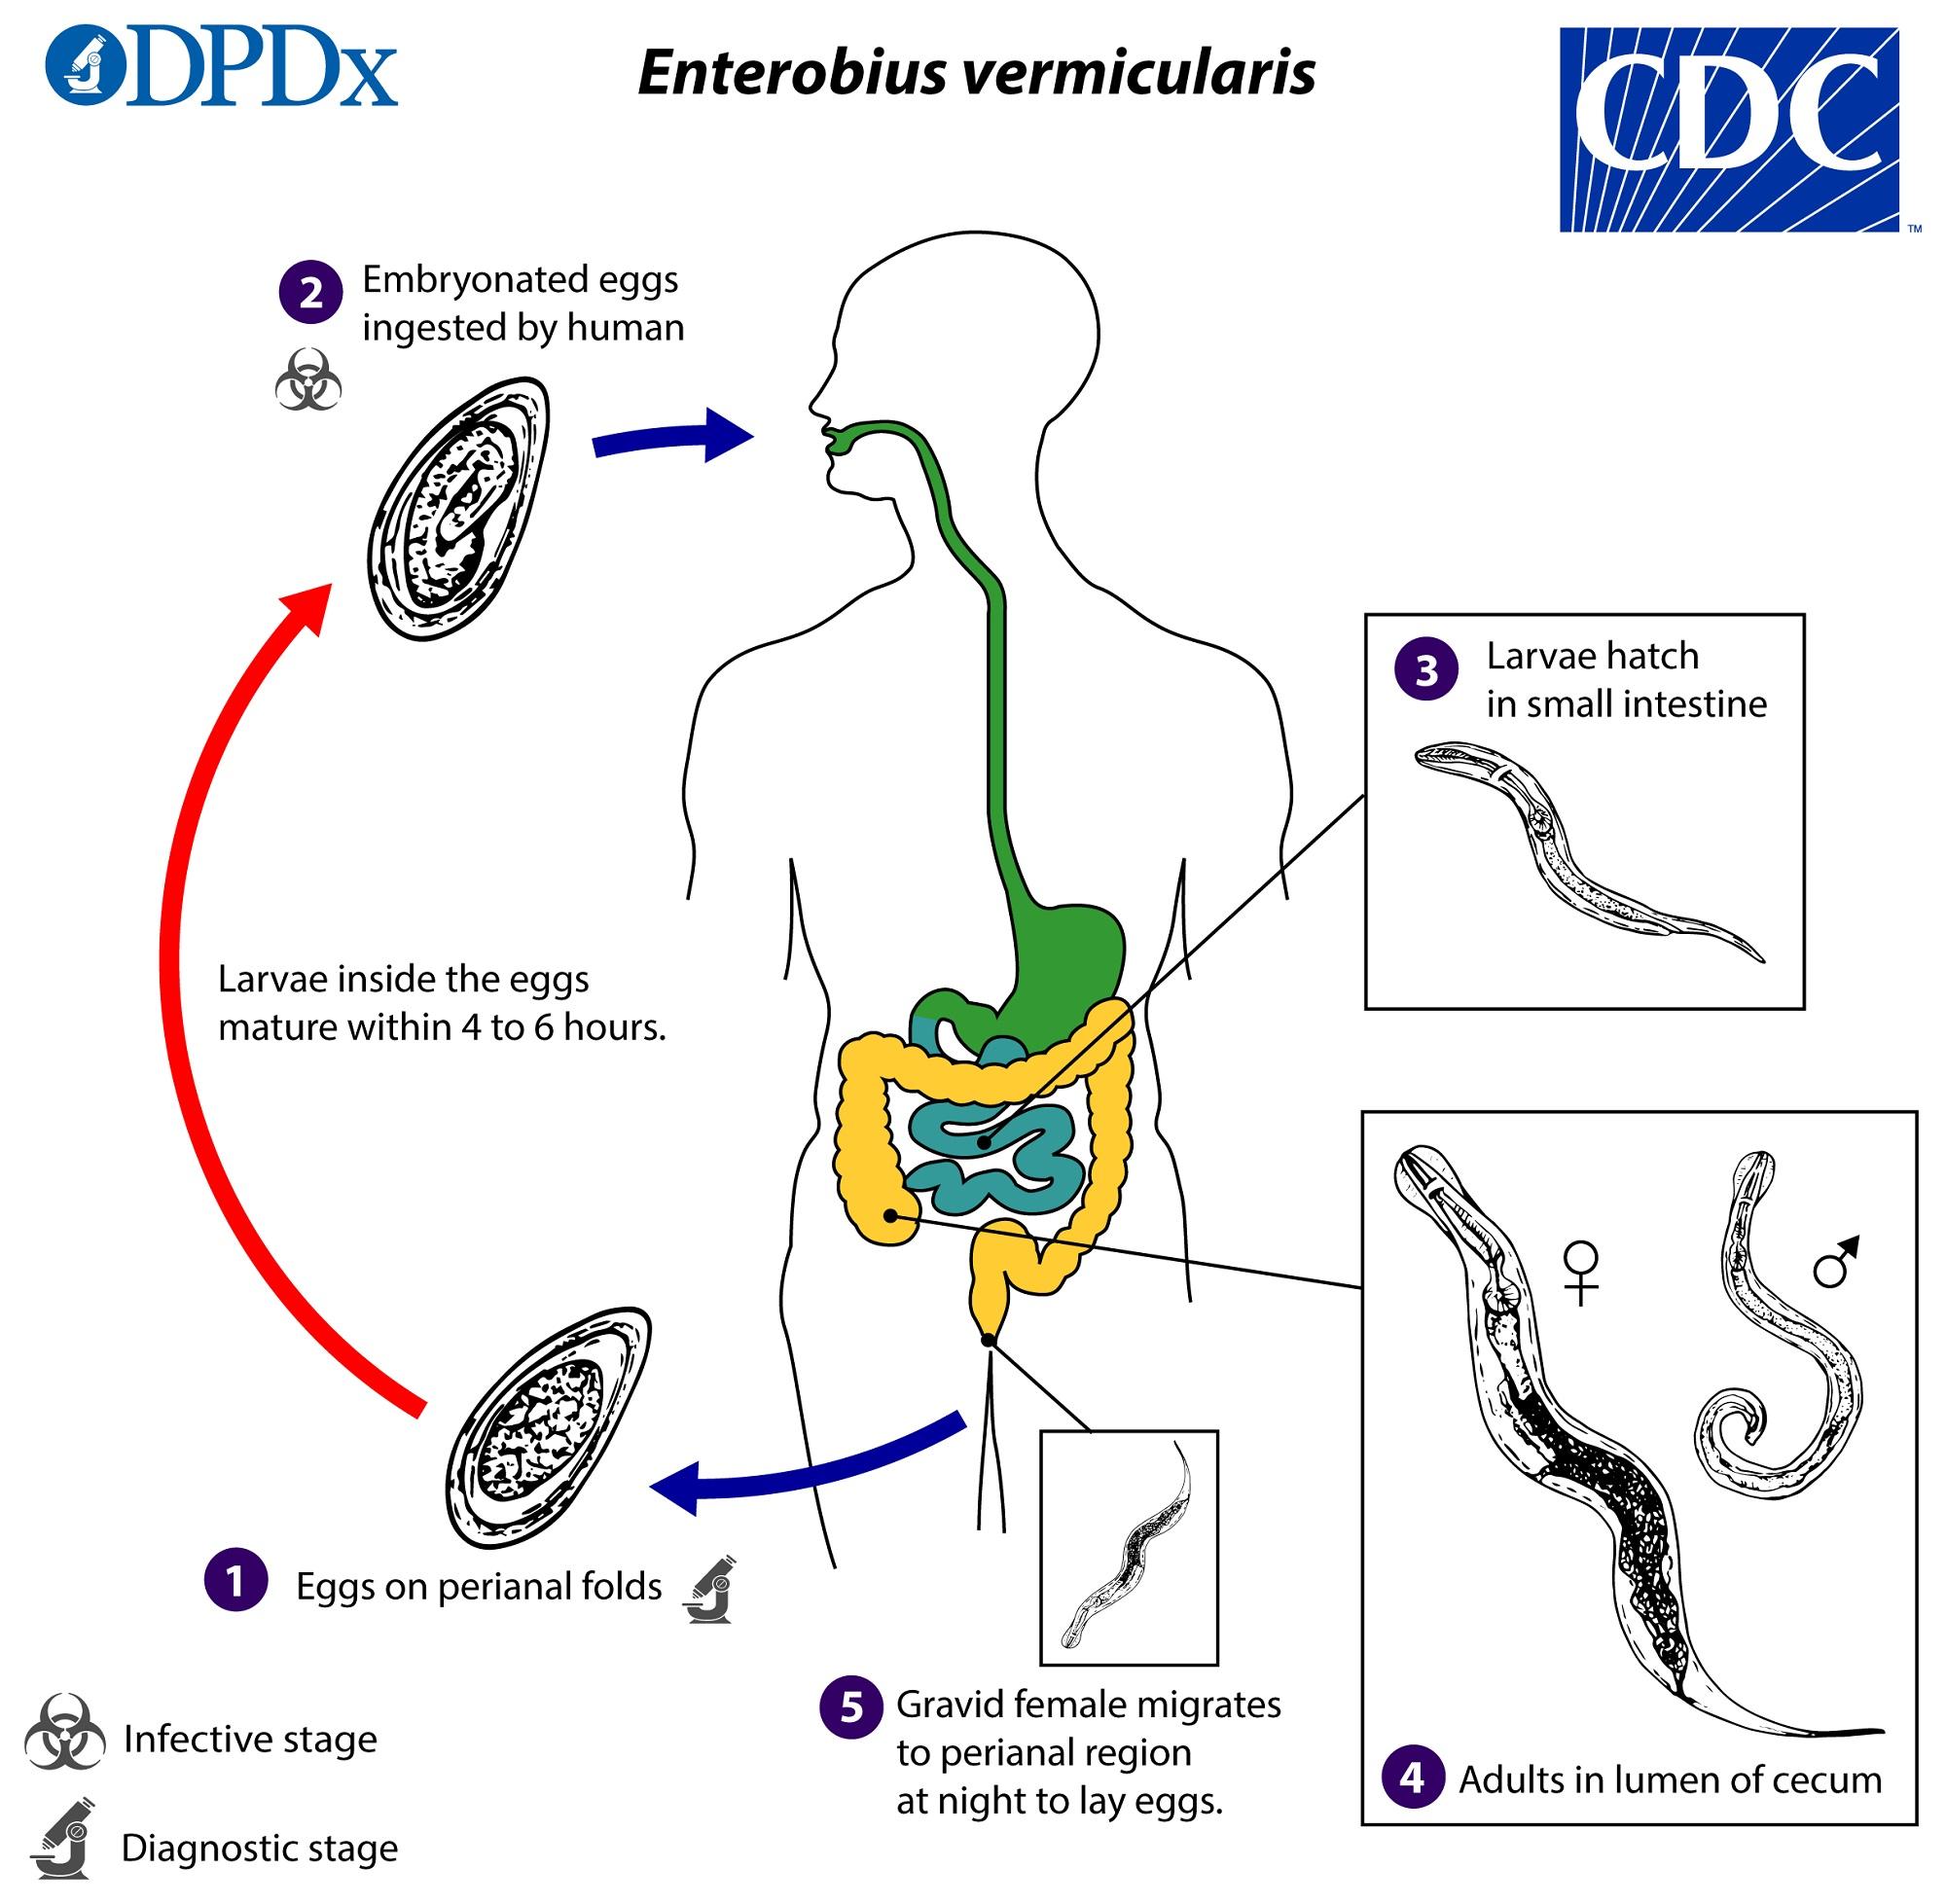 enterobius vermicularis gazdaszervezet